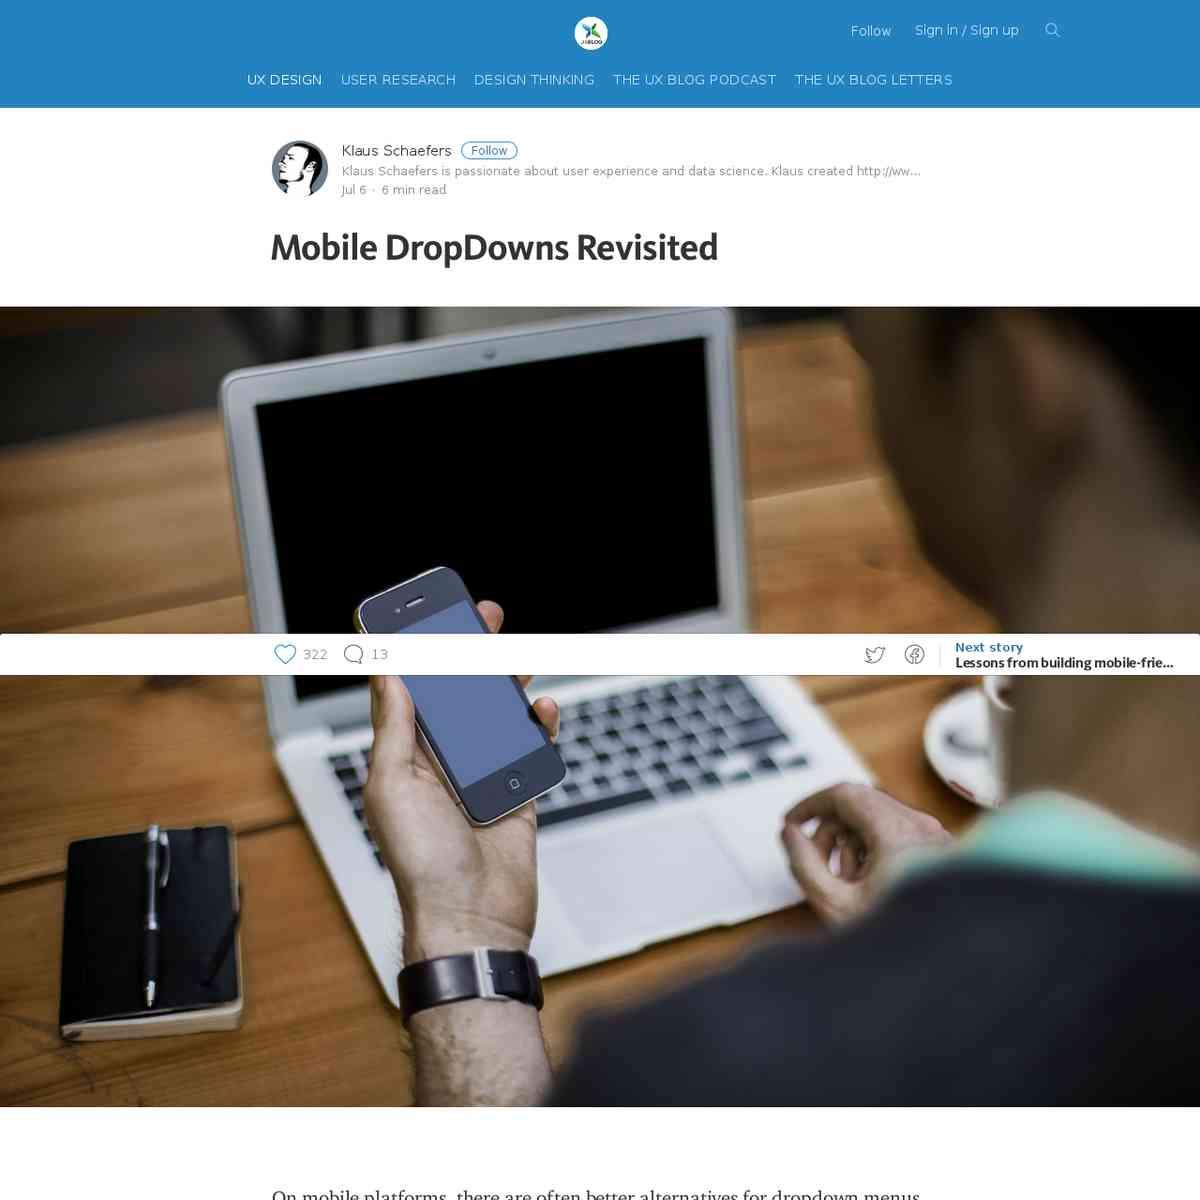 Mobile DropDowns Revisited – theuxblog.com